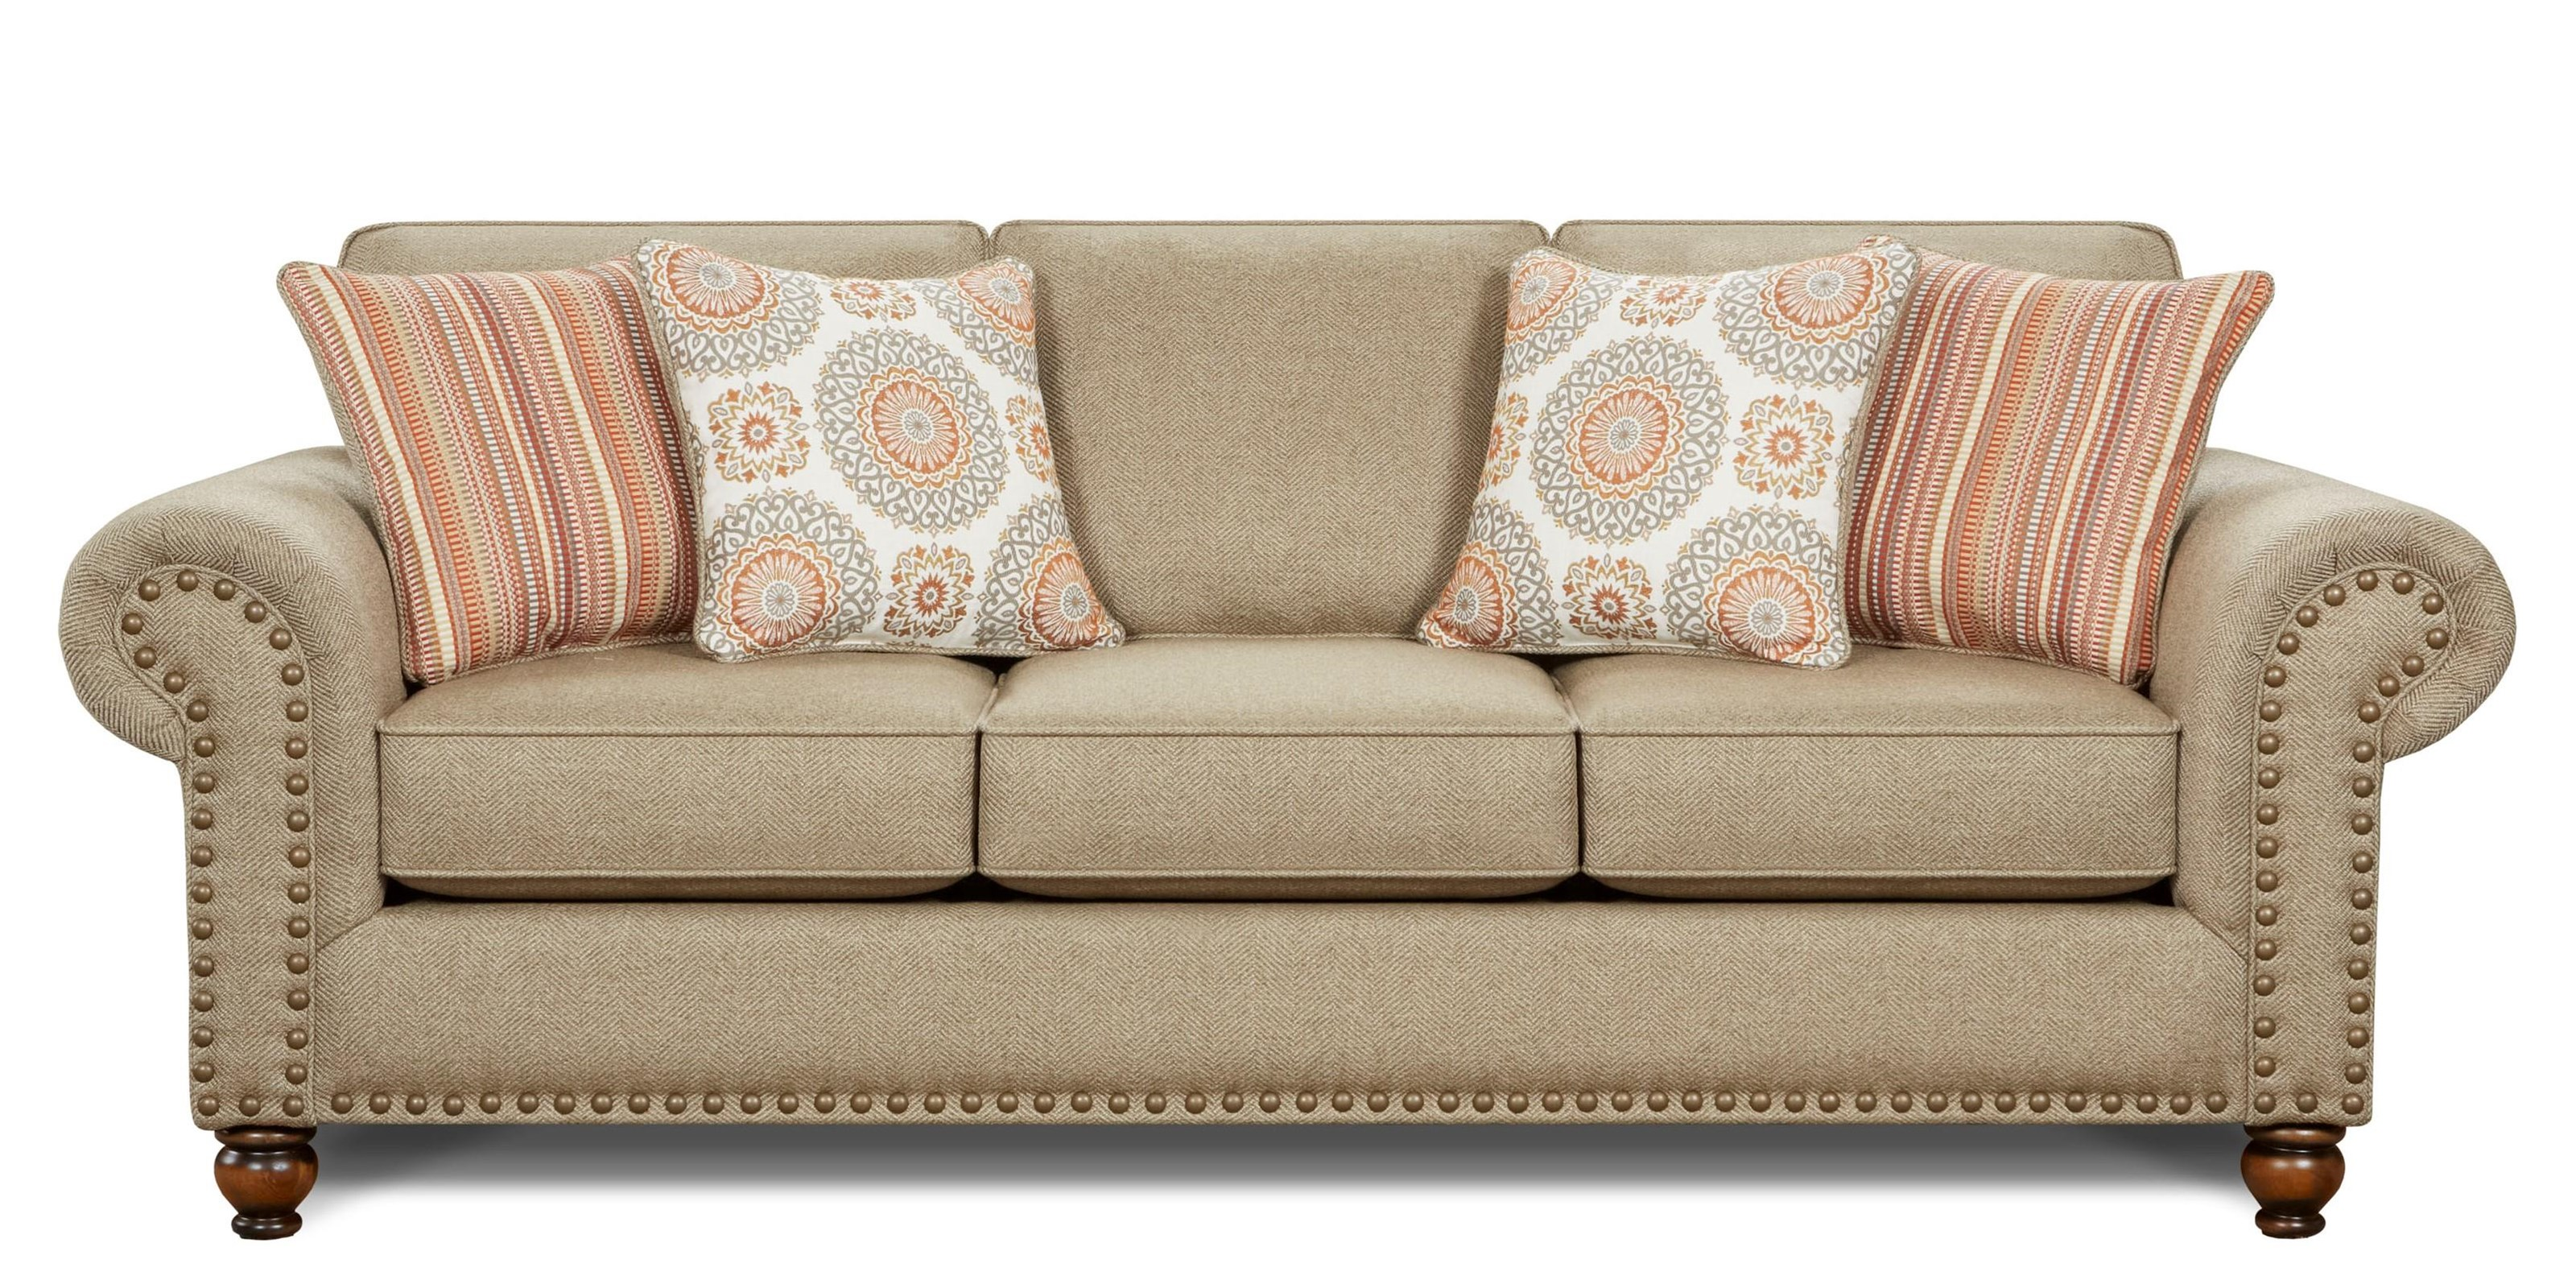 Fusion Furniture Turino Sisal Turino Sisal Sofa - Item Number: 3110 TURINO-SISAL